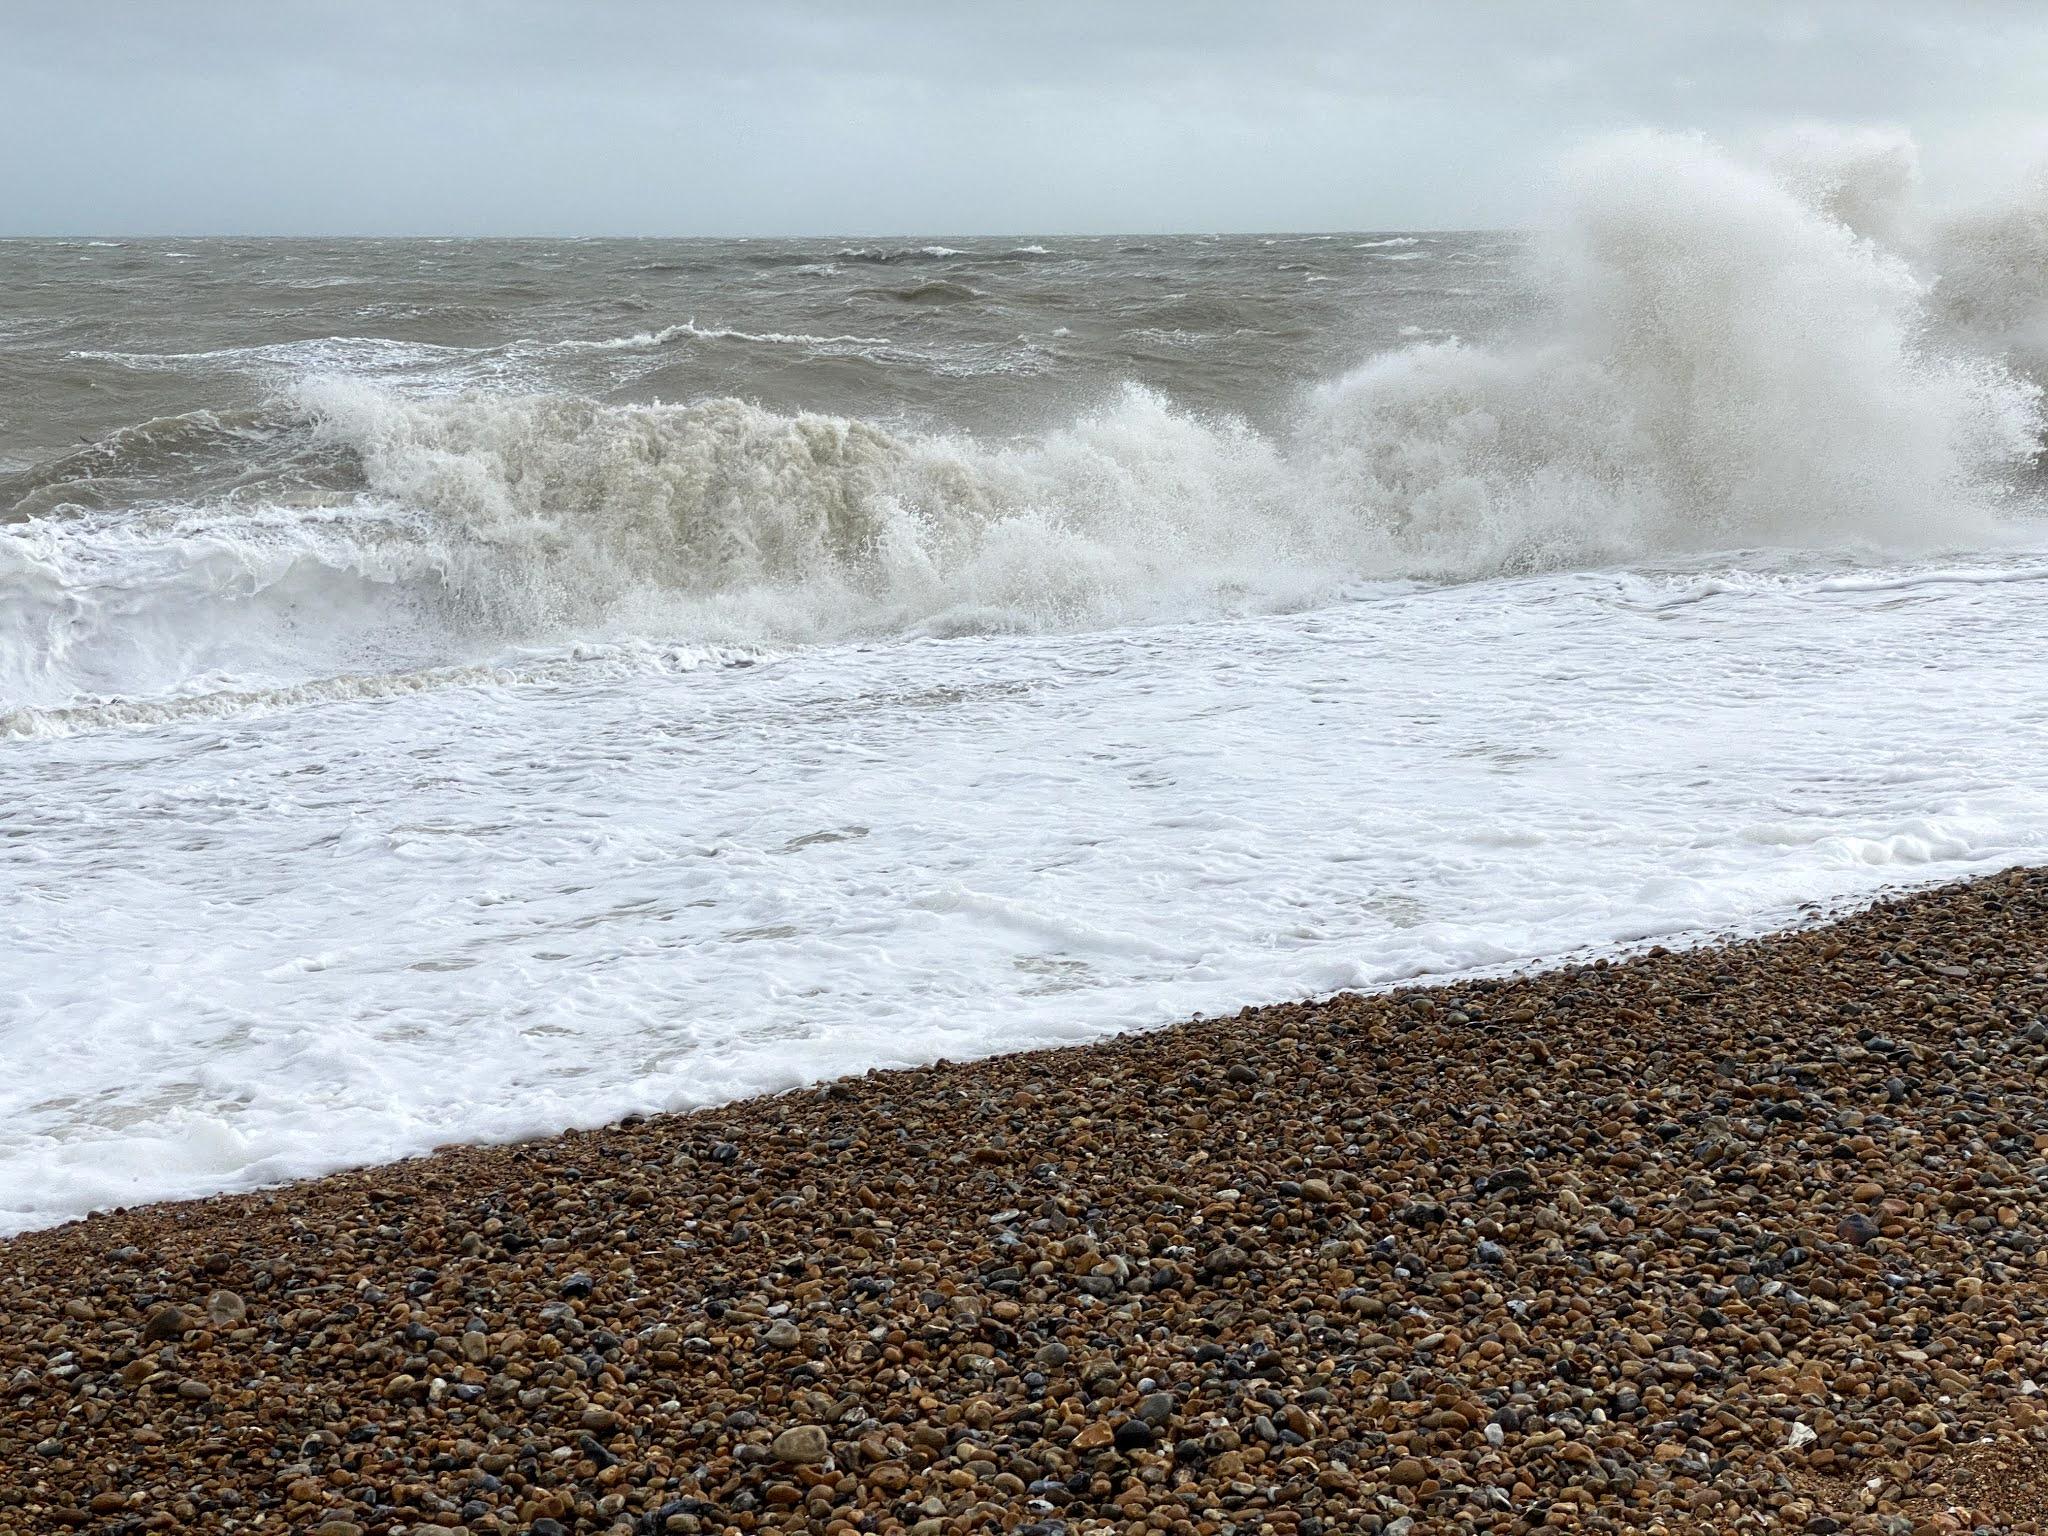 Waves crashing on a stony beach